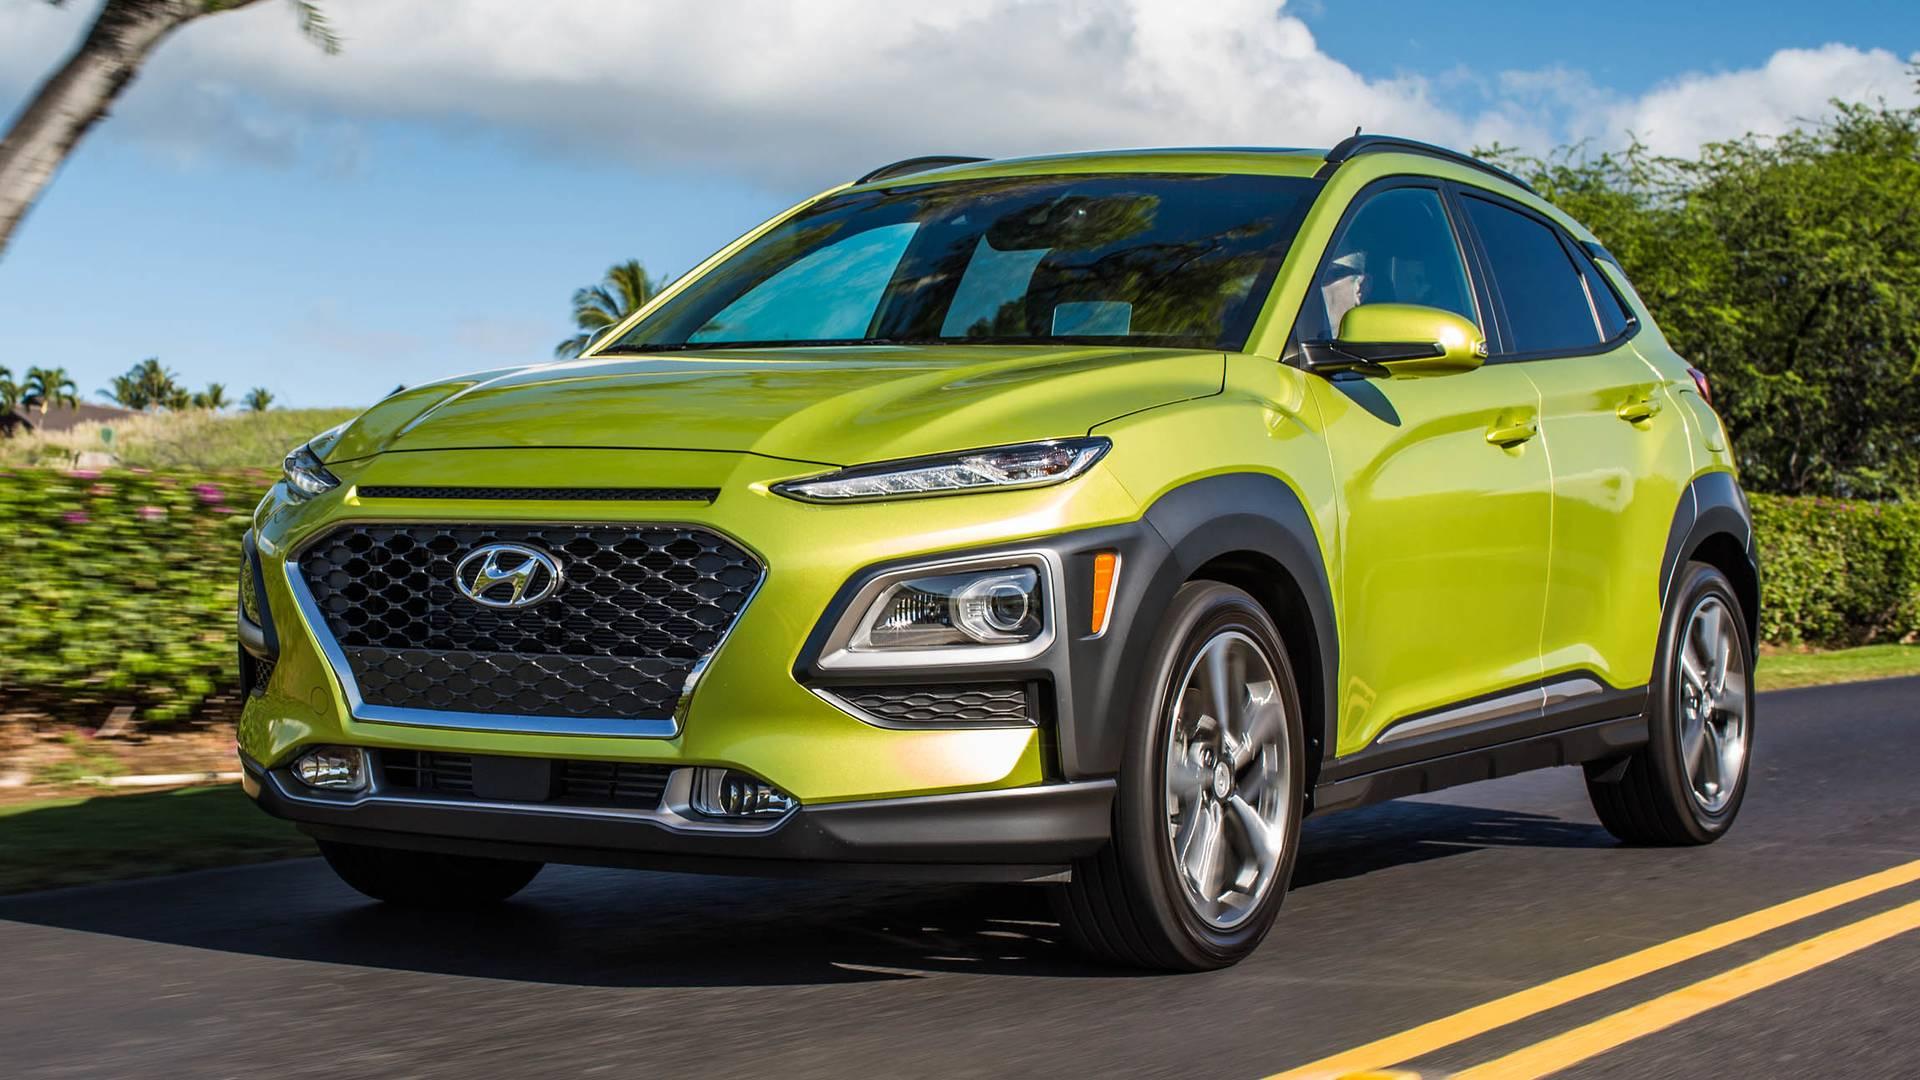 Xe Hyundai Kona 2018 1